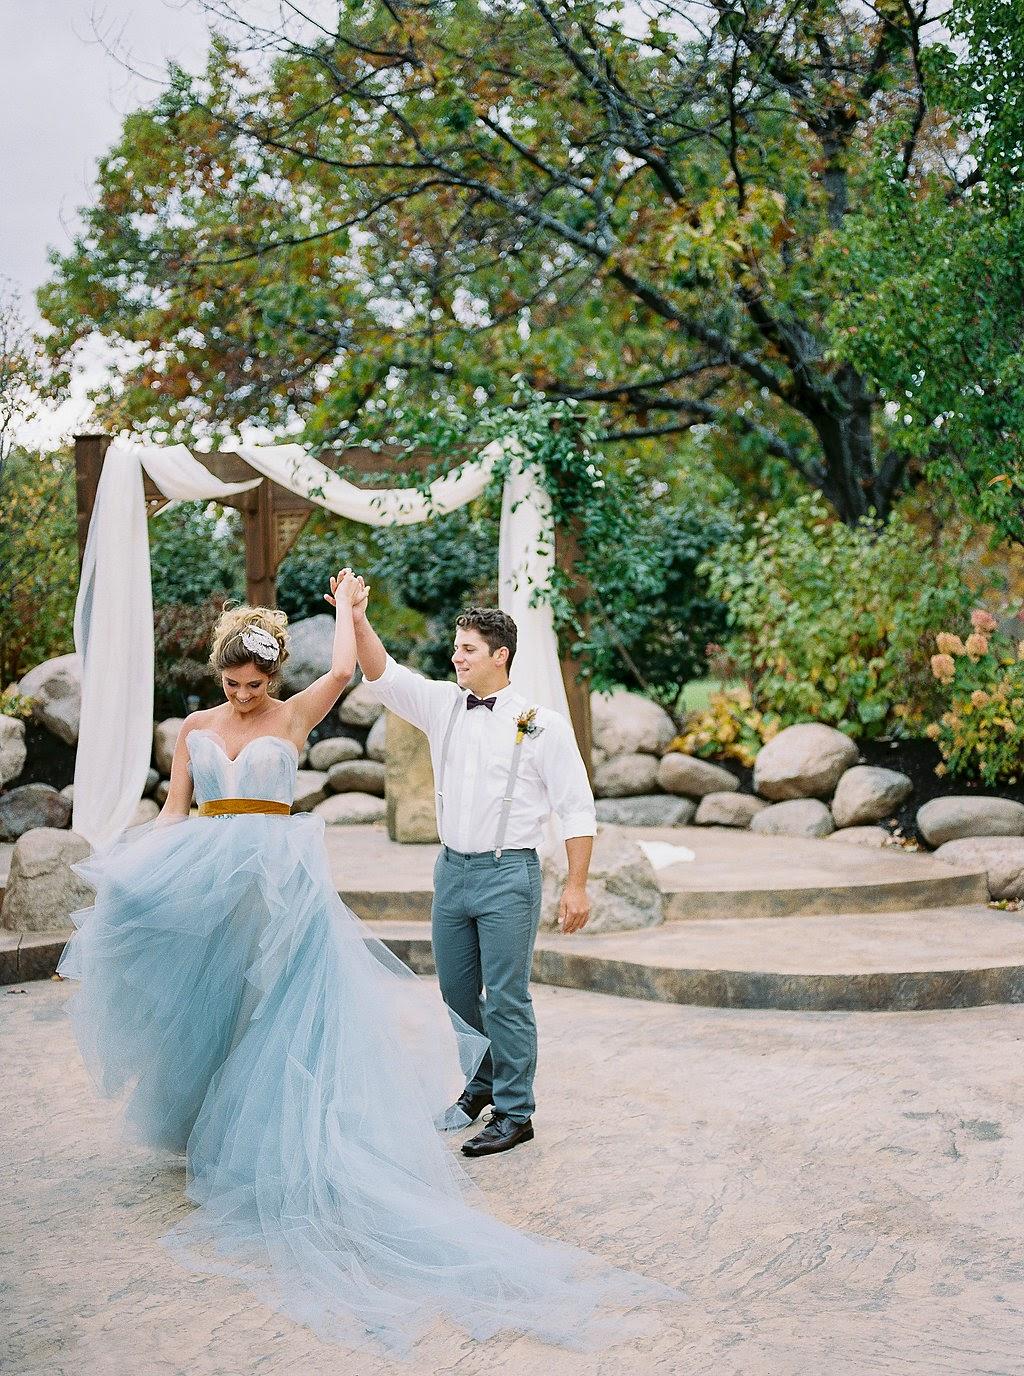 Alexandra-Elise-Photography-Ali-Reed-Film-Wedding-Photographer-Deerfield-Country-Club-063.jpg